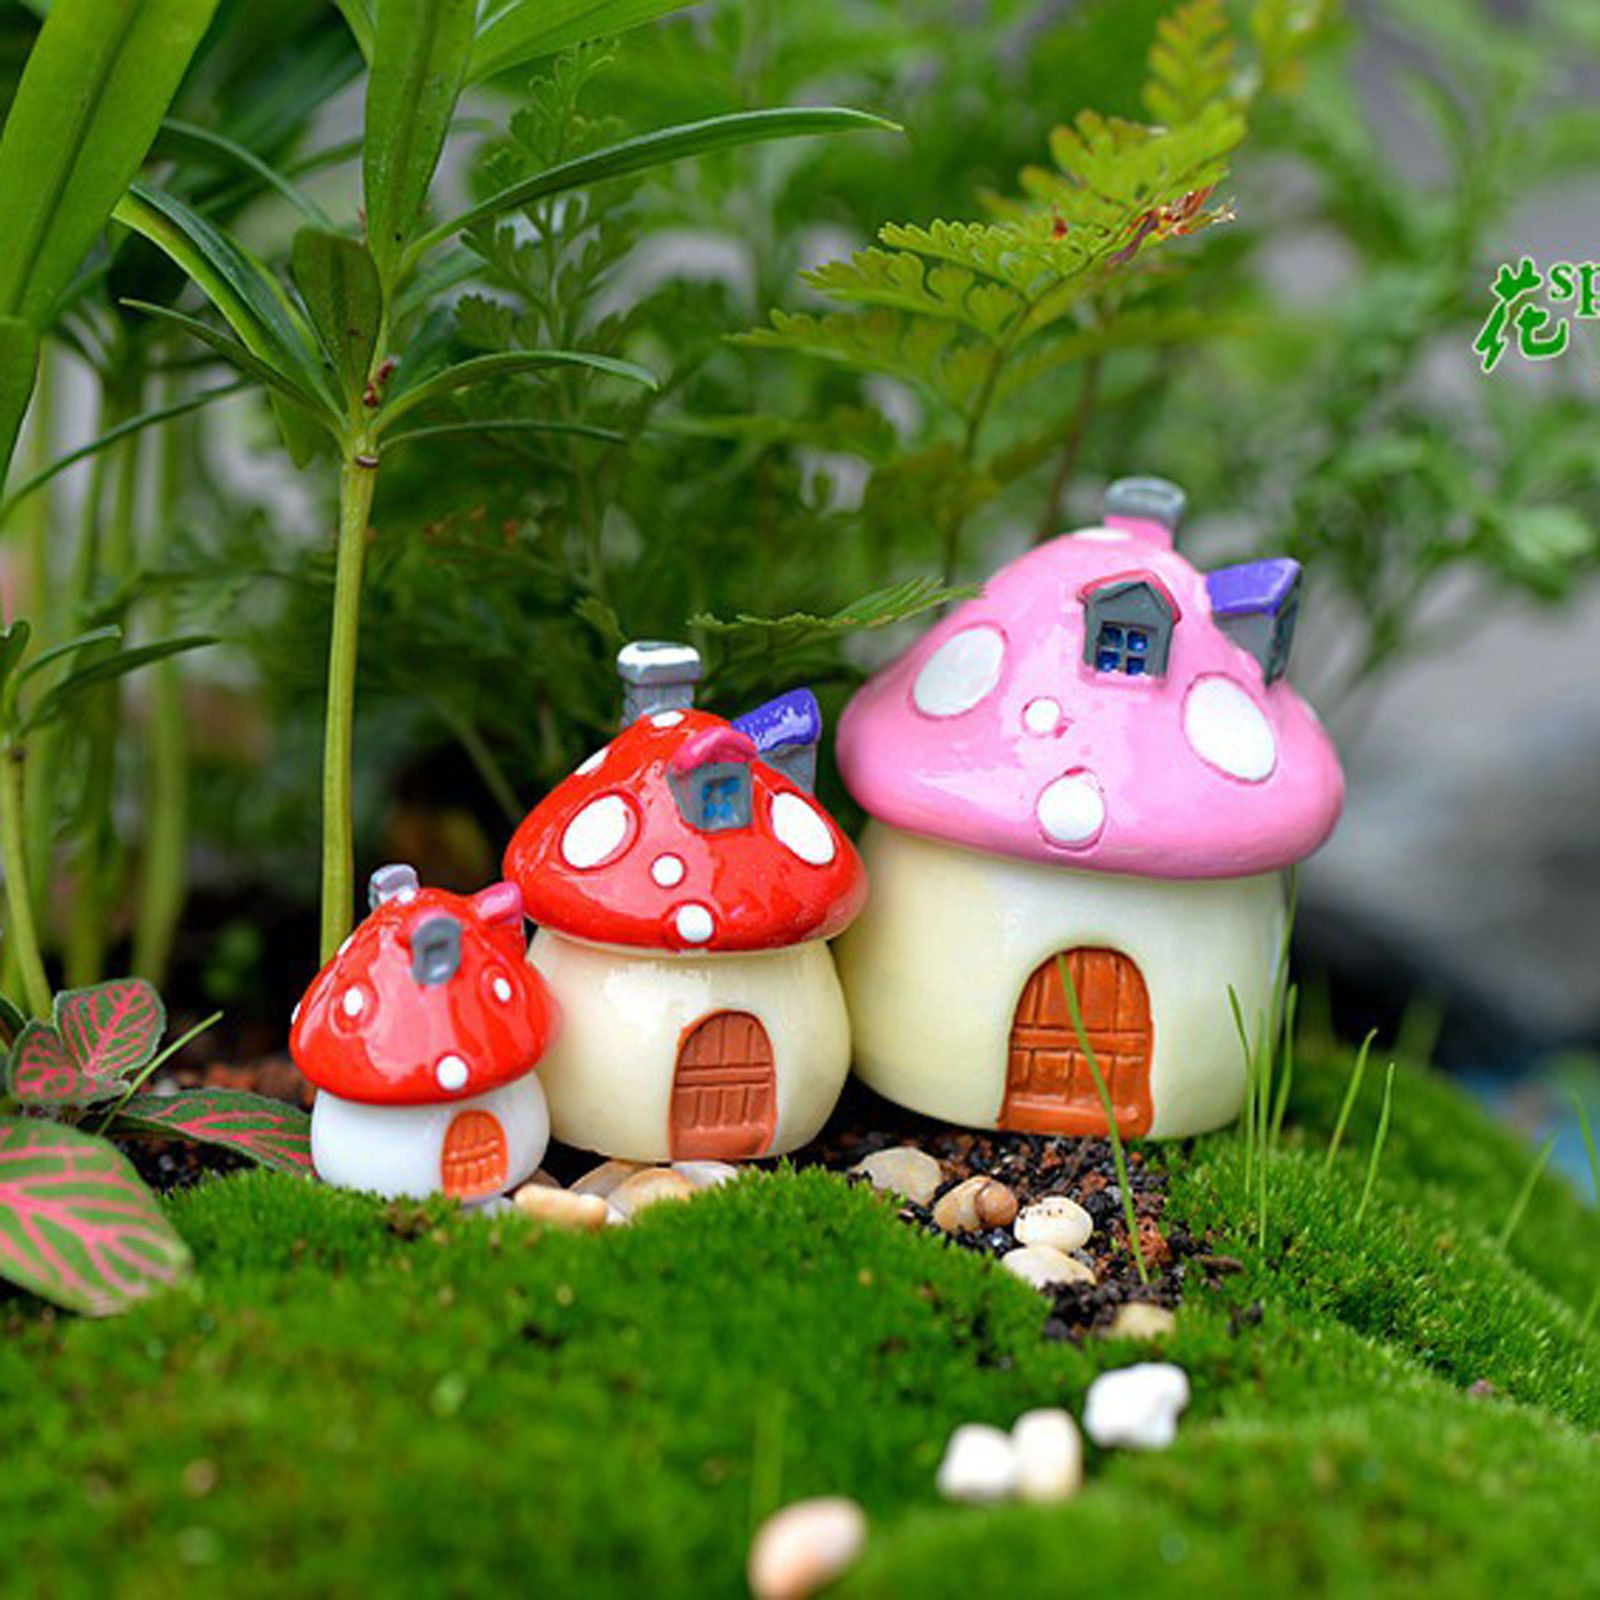 Mushroom House Resin Figurine Craft Plant Pot Fairy Garden Decor ...